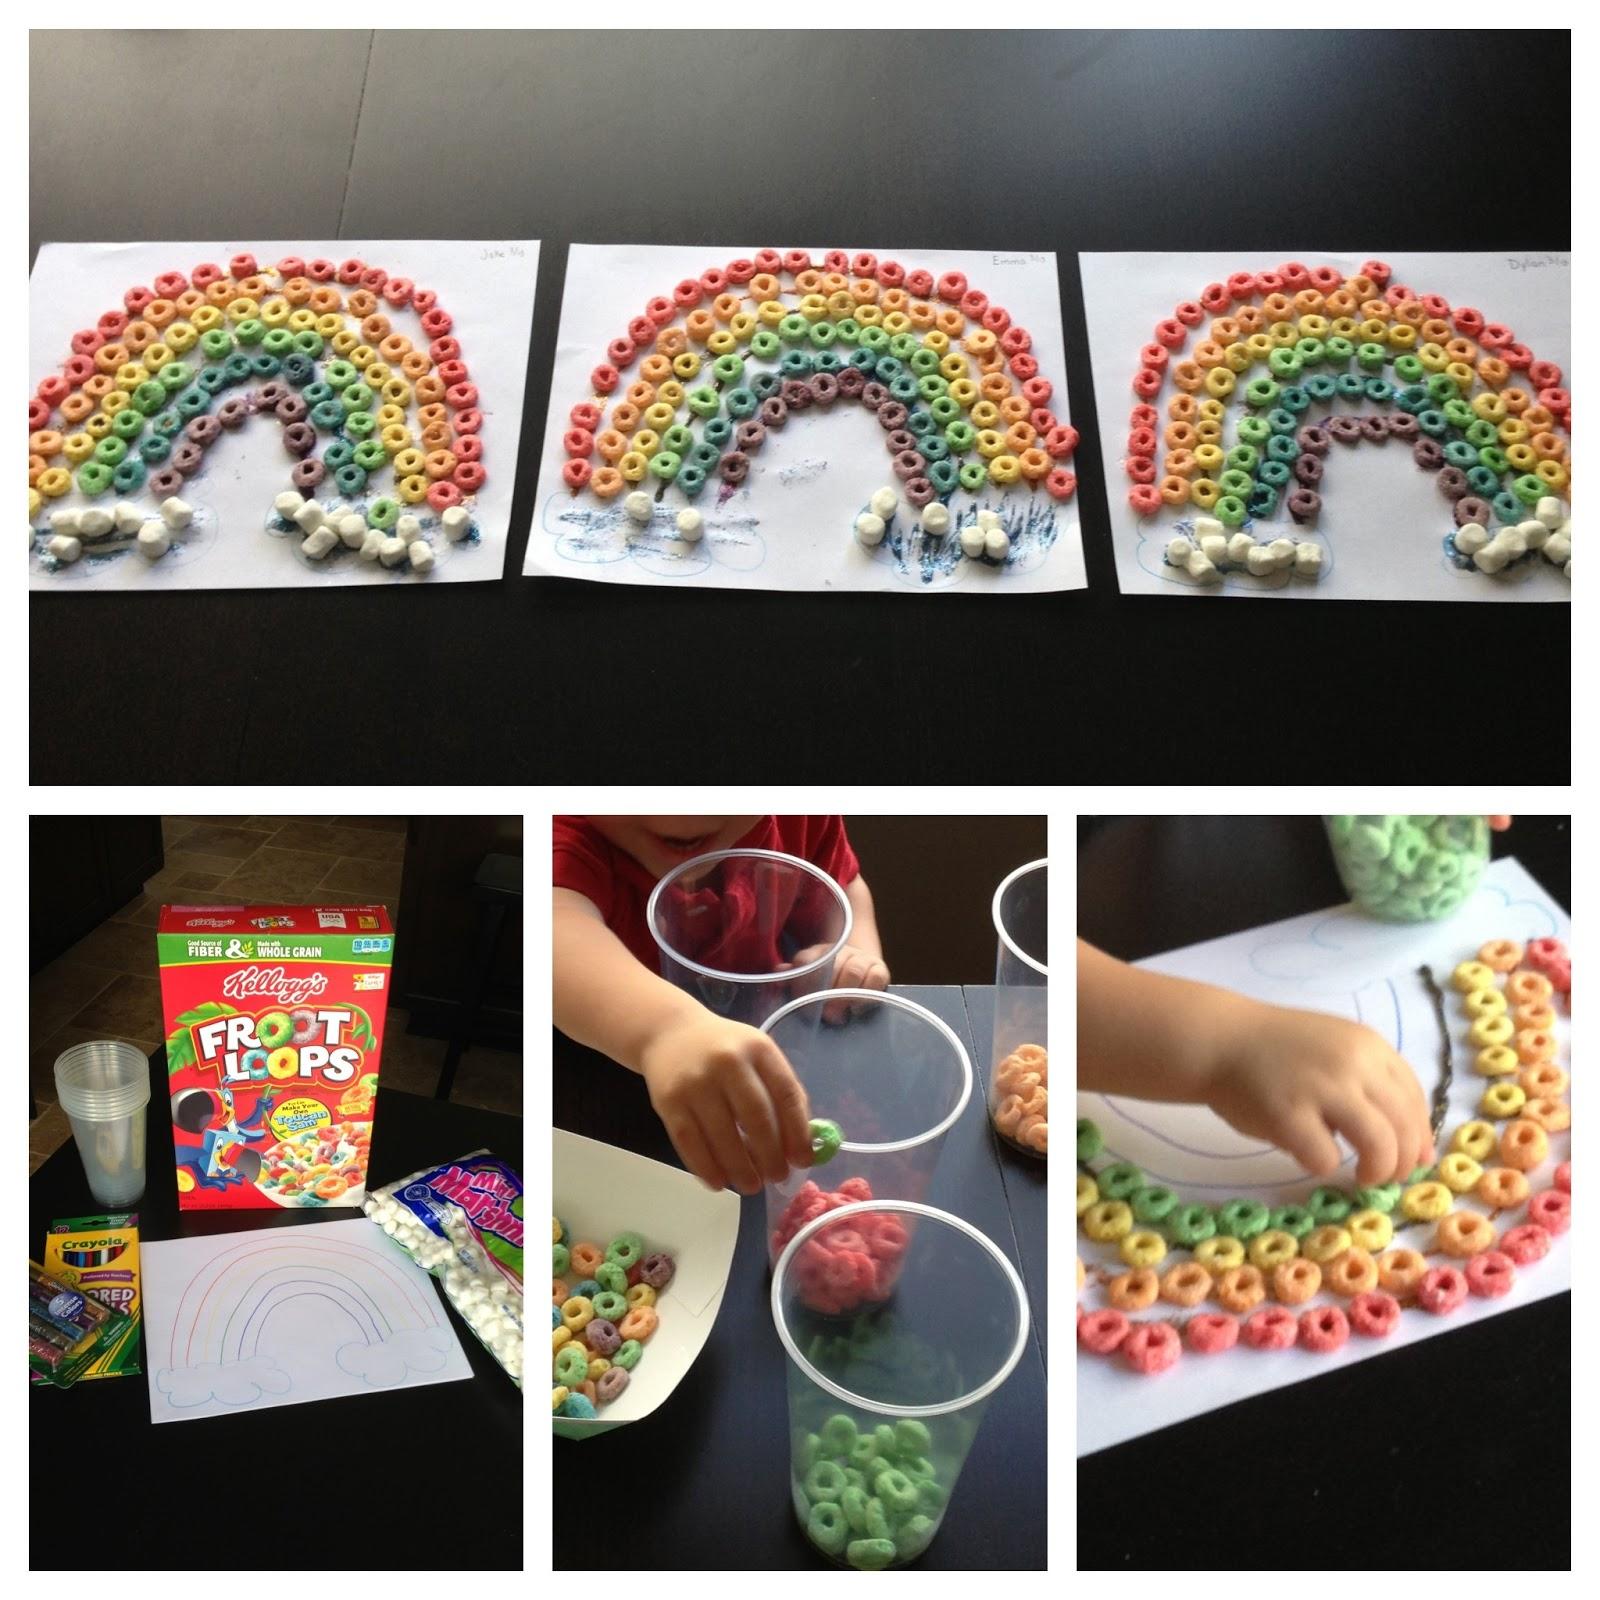 Party Of 5 Snacktivity Fruit Loop Rainbows